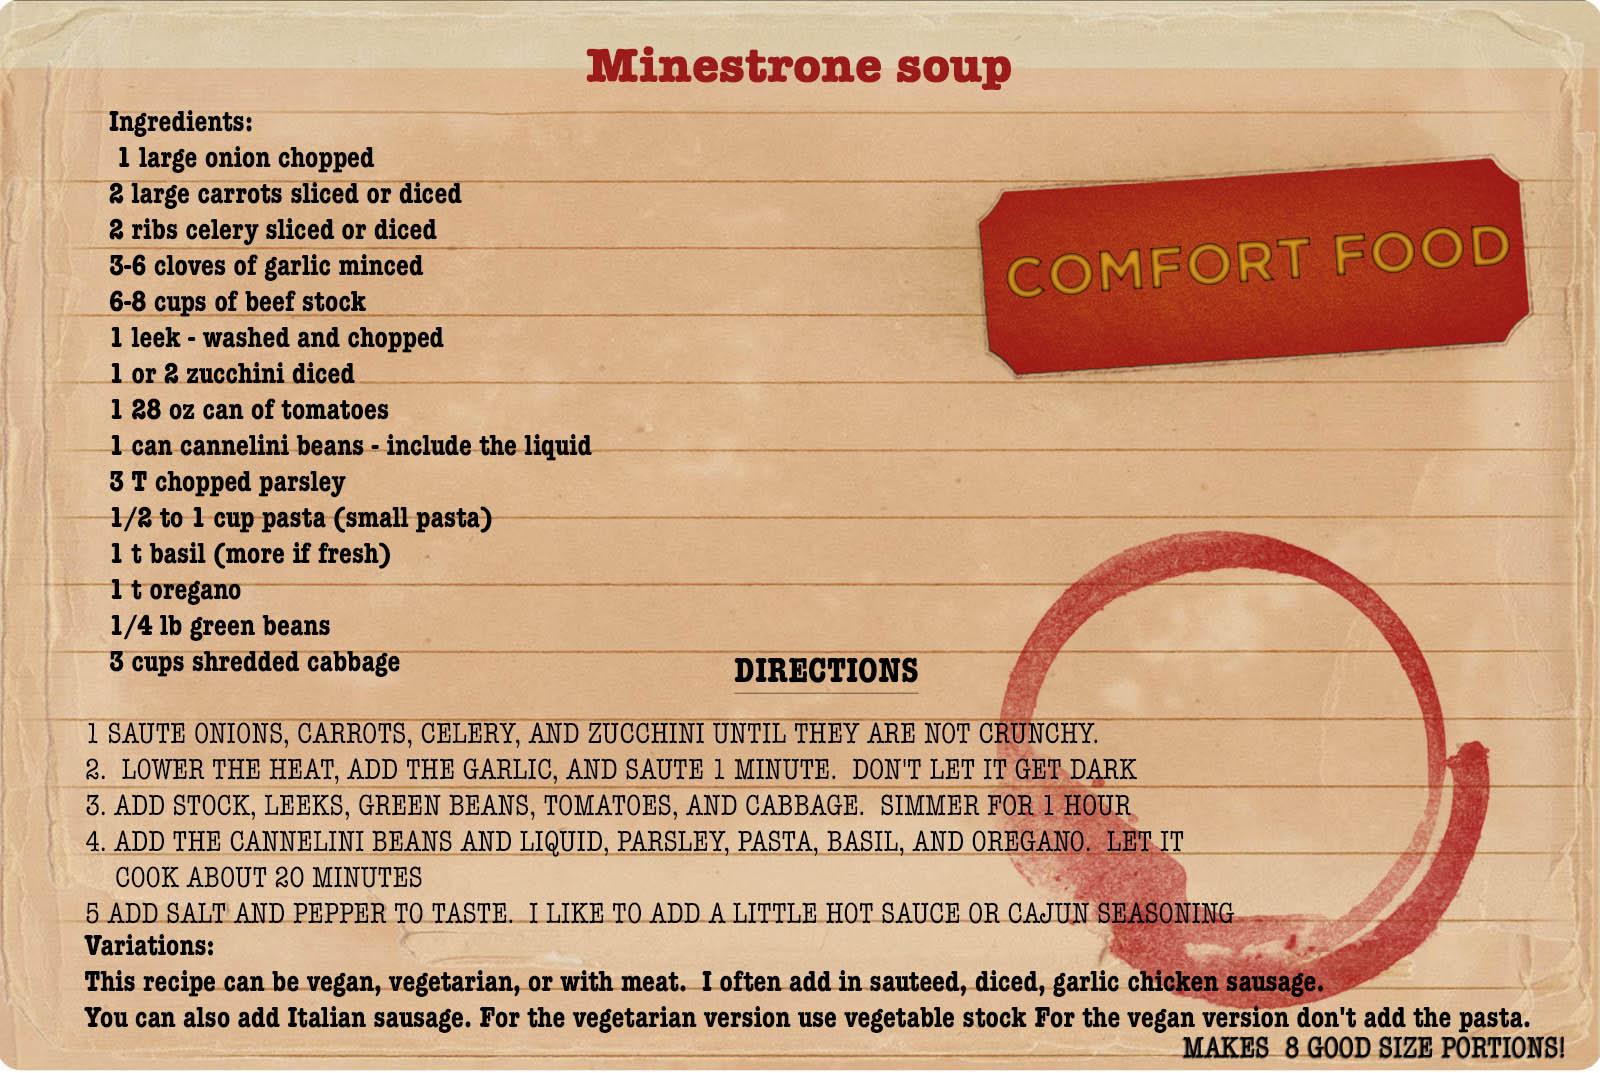 Min Soup.jpg